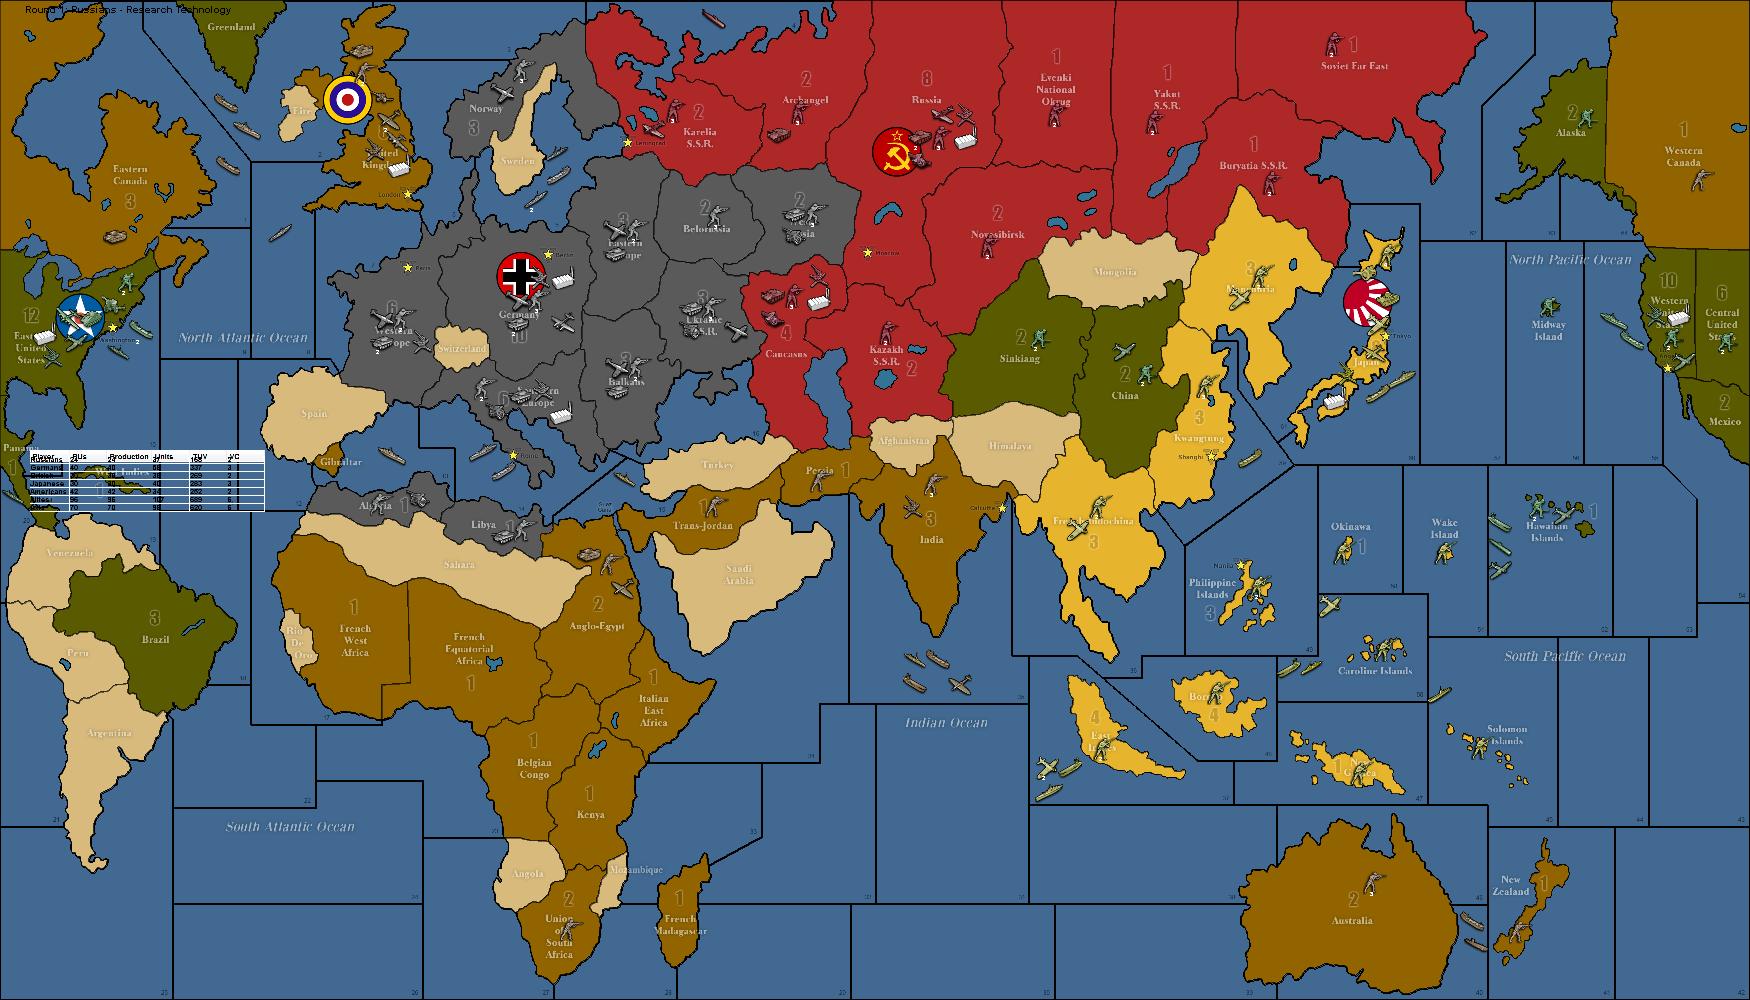 Attractive World War II Revised